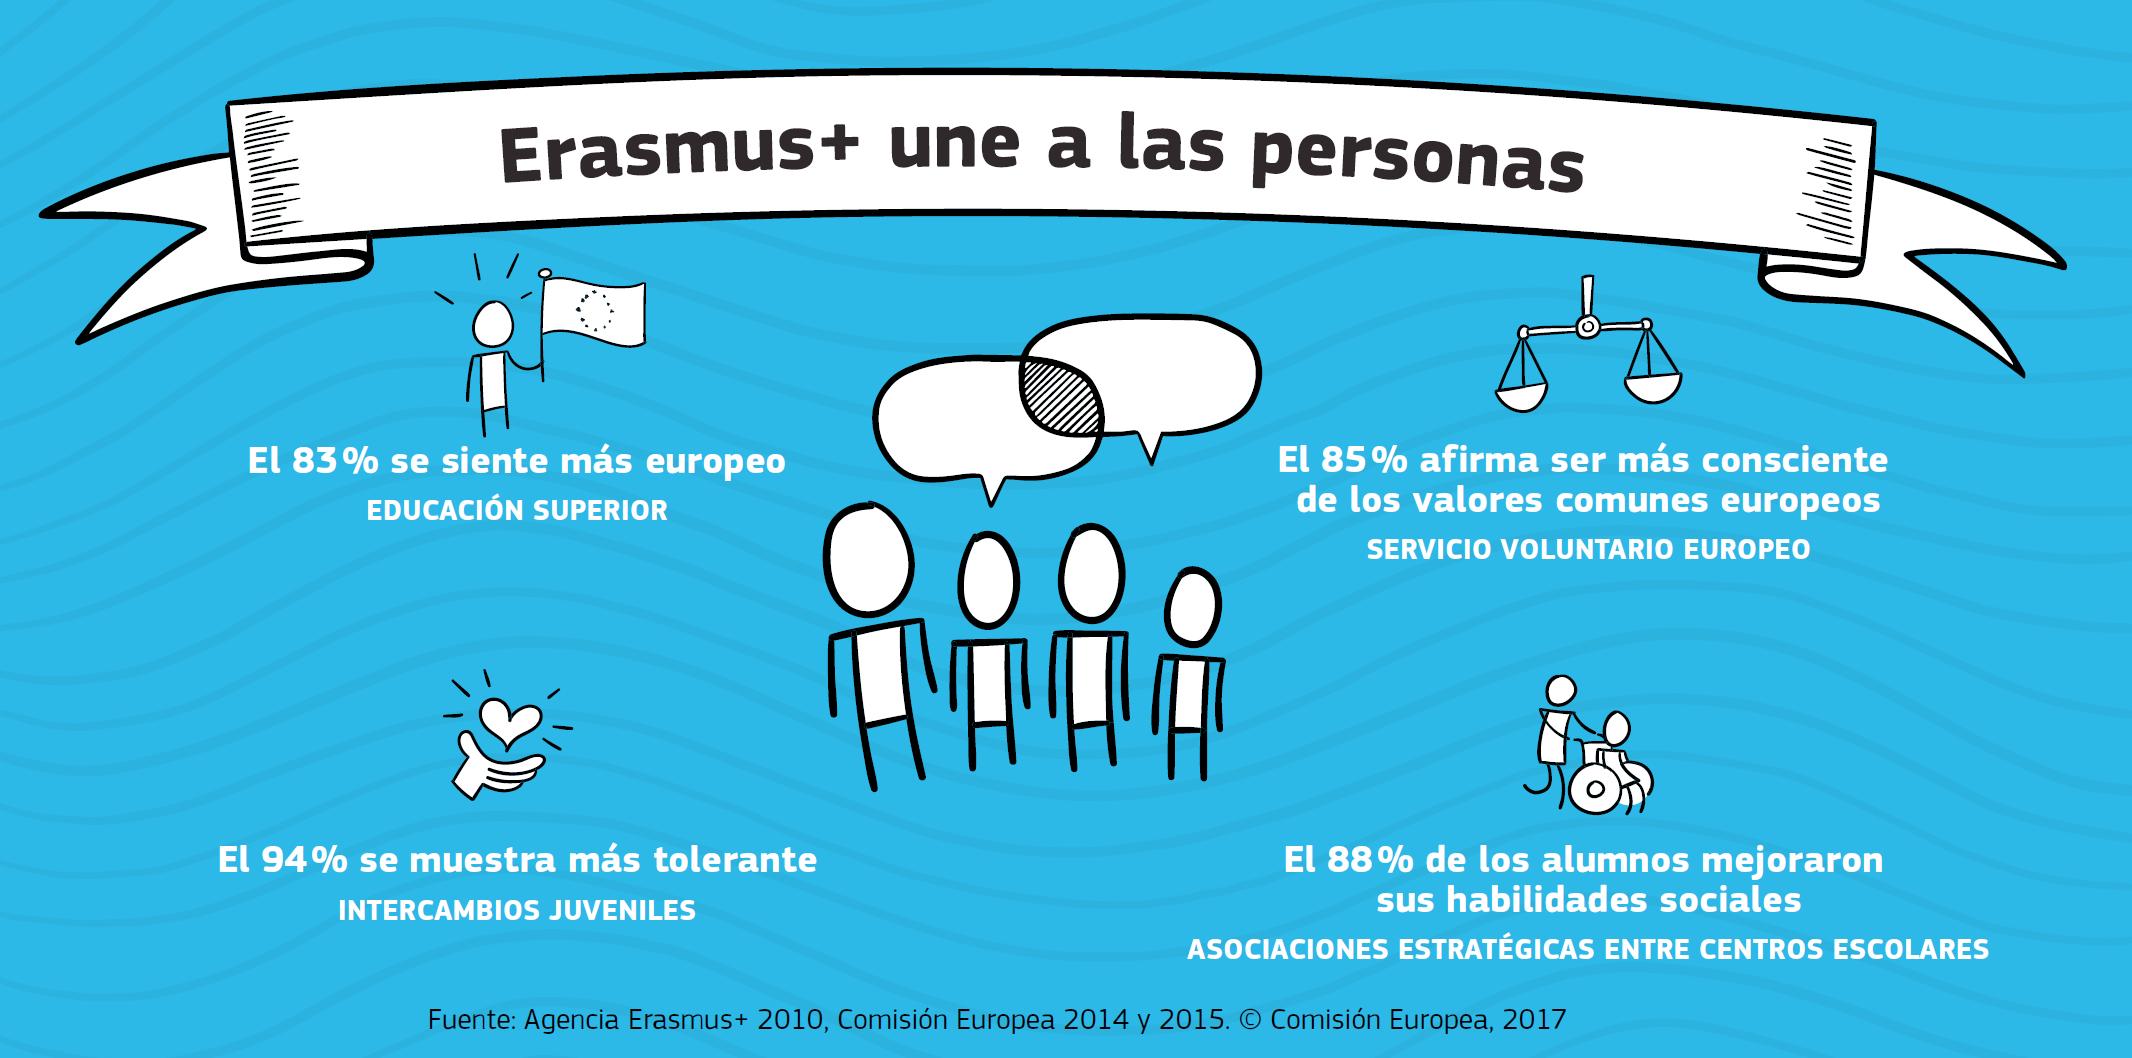 2018 Erasmus + Une